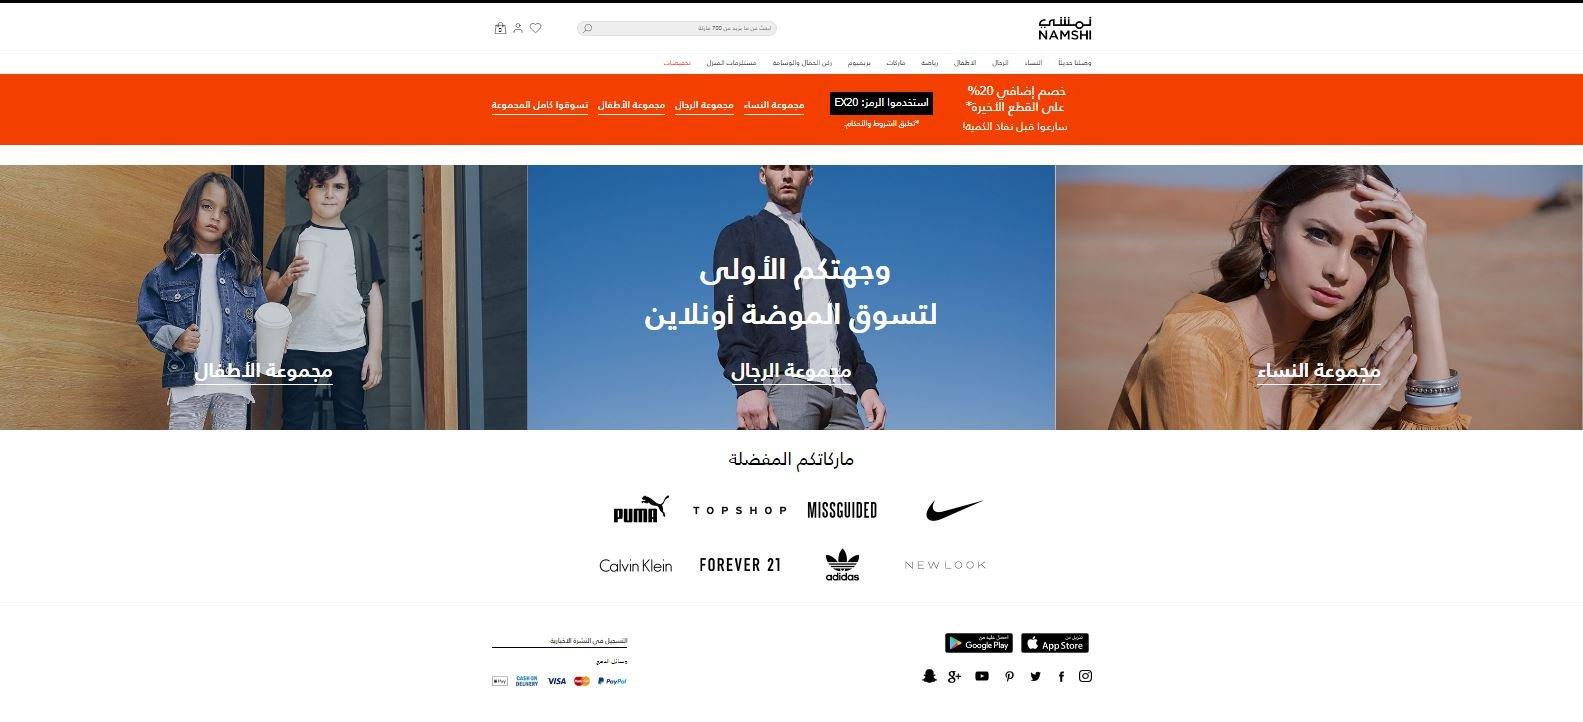 1bc30cc70 يعتبر موقع نمشي من أهمّ مواقع التسوّق الإلكتروني في السعودية وفي الشرق  الأوسط، إذ يضمّ أكثر من 600 ماركة عالمية ومحلية، مثل Mango و Adiddas  وMichael Kors و ...